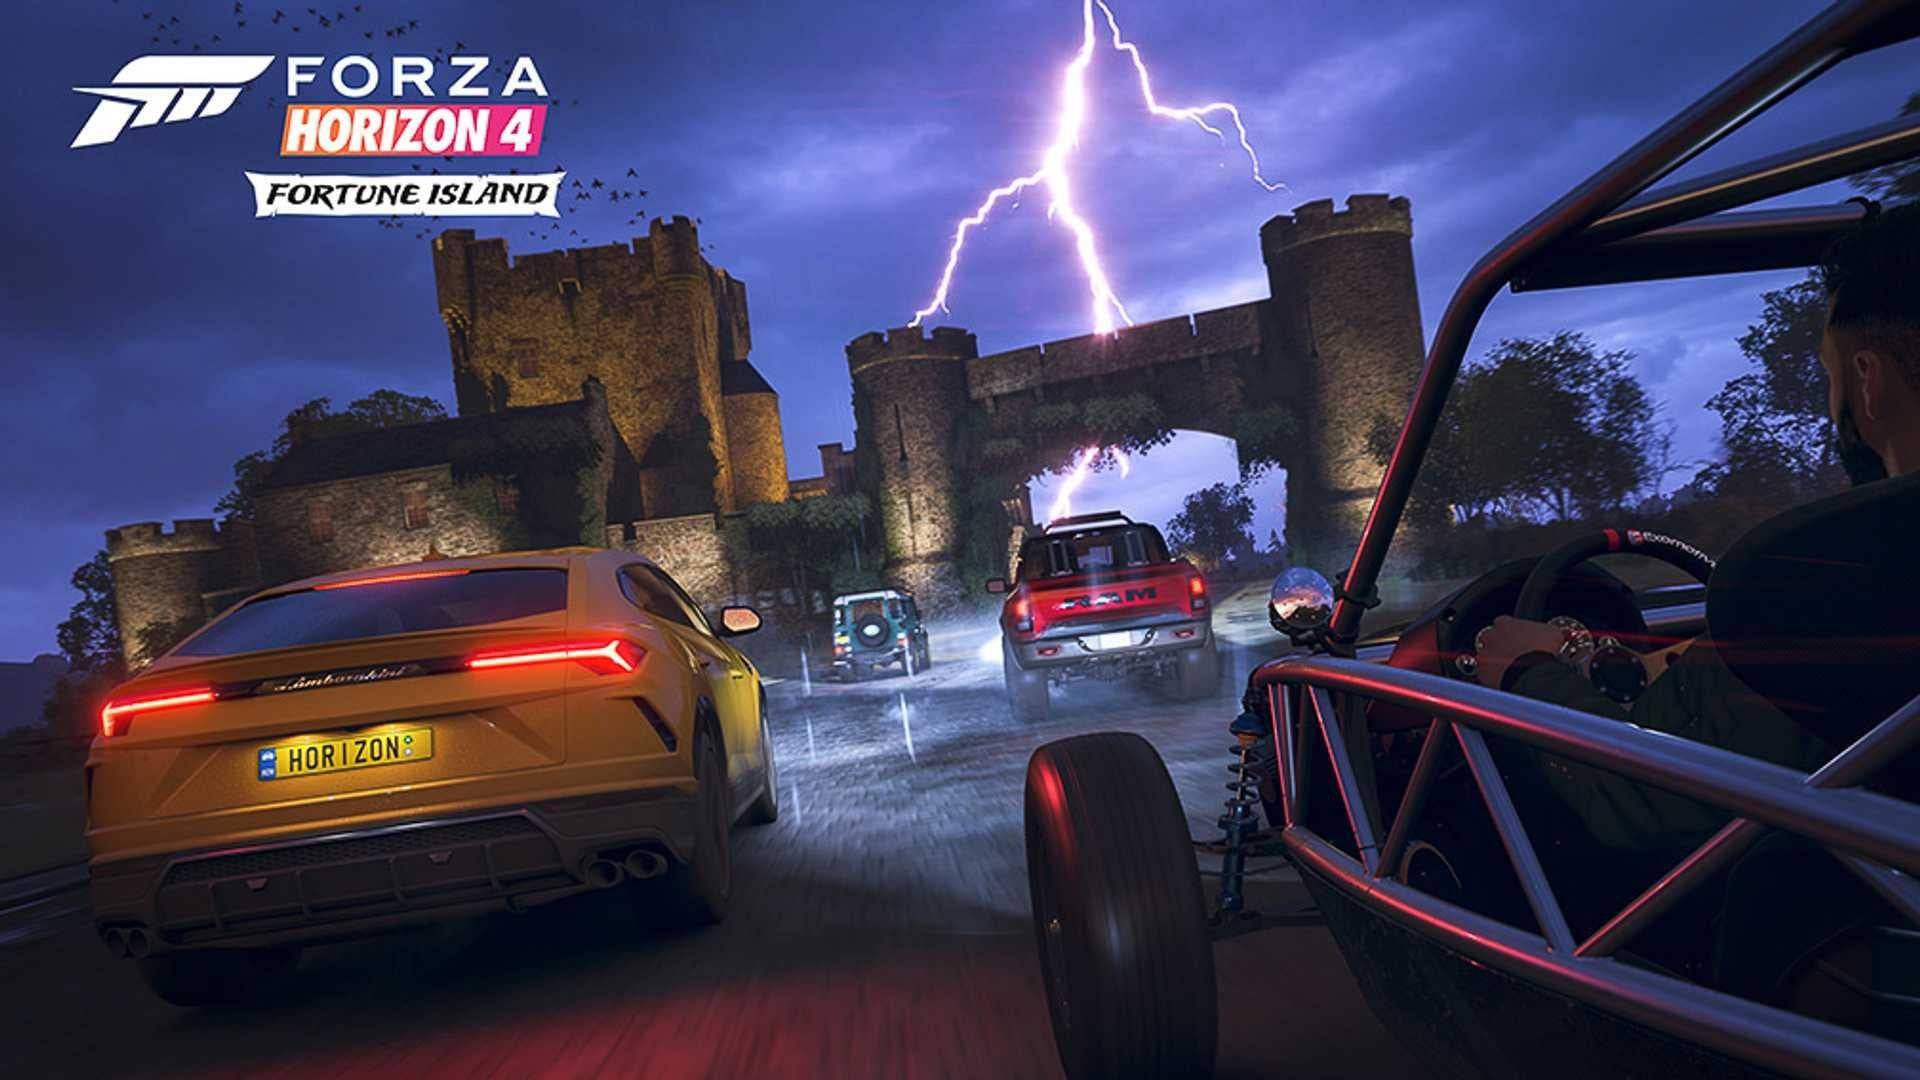 Exclusive: Forza Horizon 4's Fortune Island Expansion Achievement